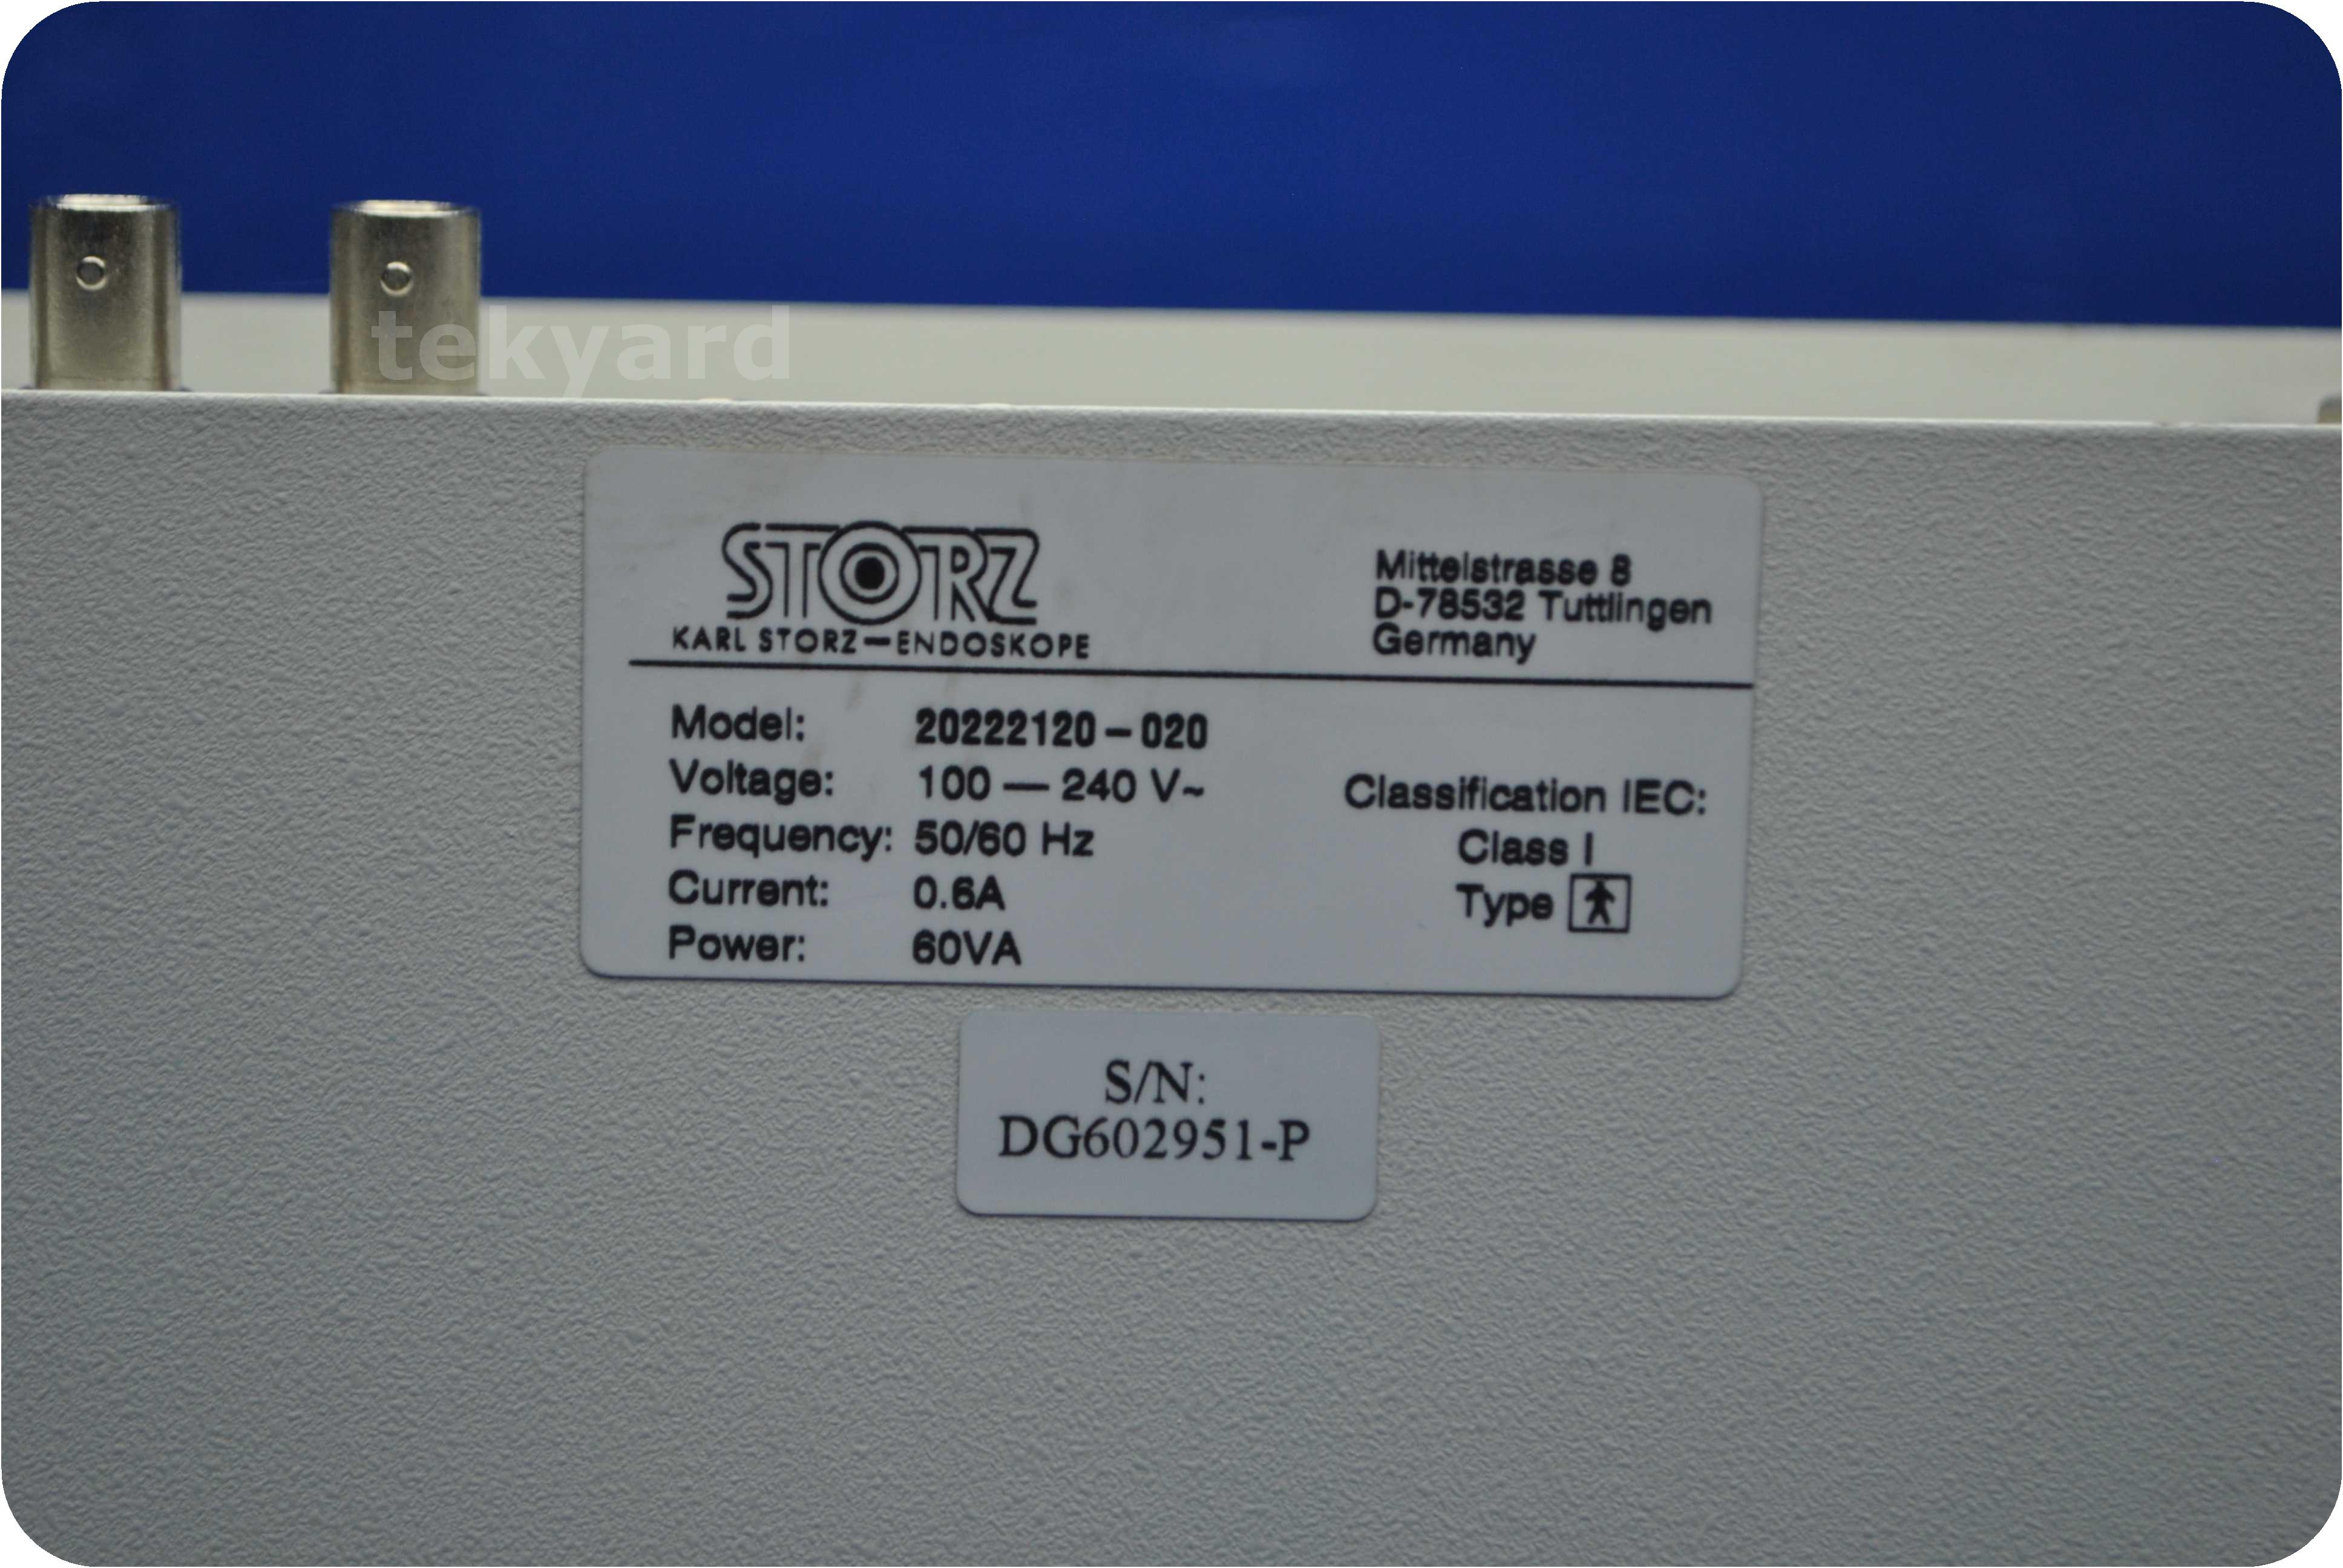 tekyard, LLC  - Karl Storz - Endoskope tricam SL ntsc 202221